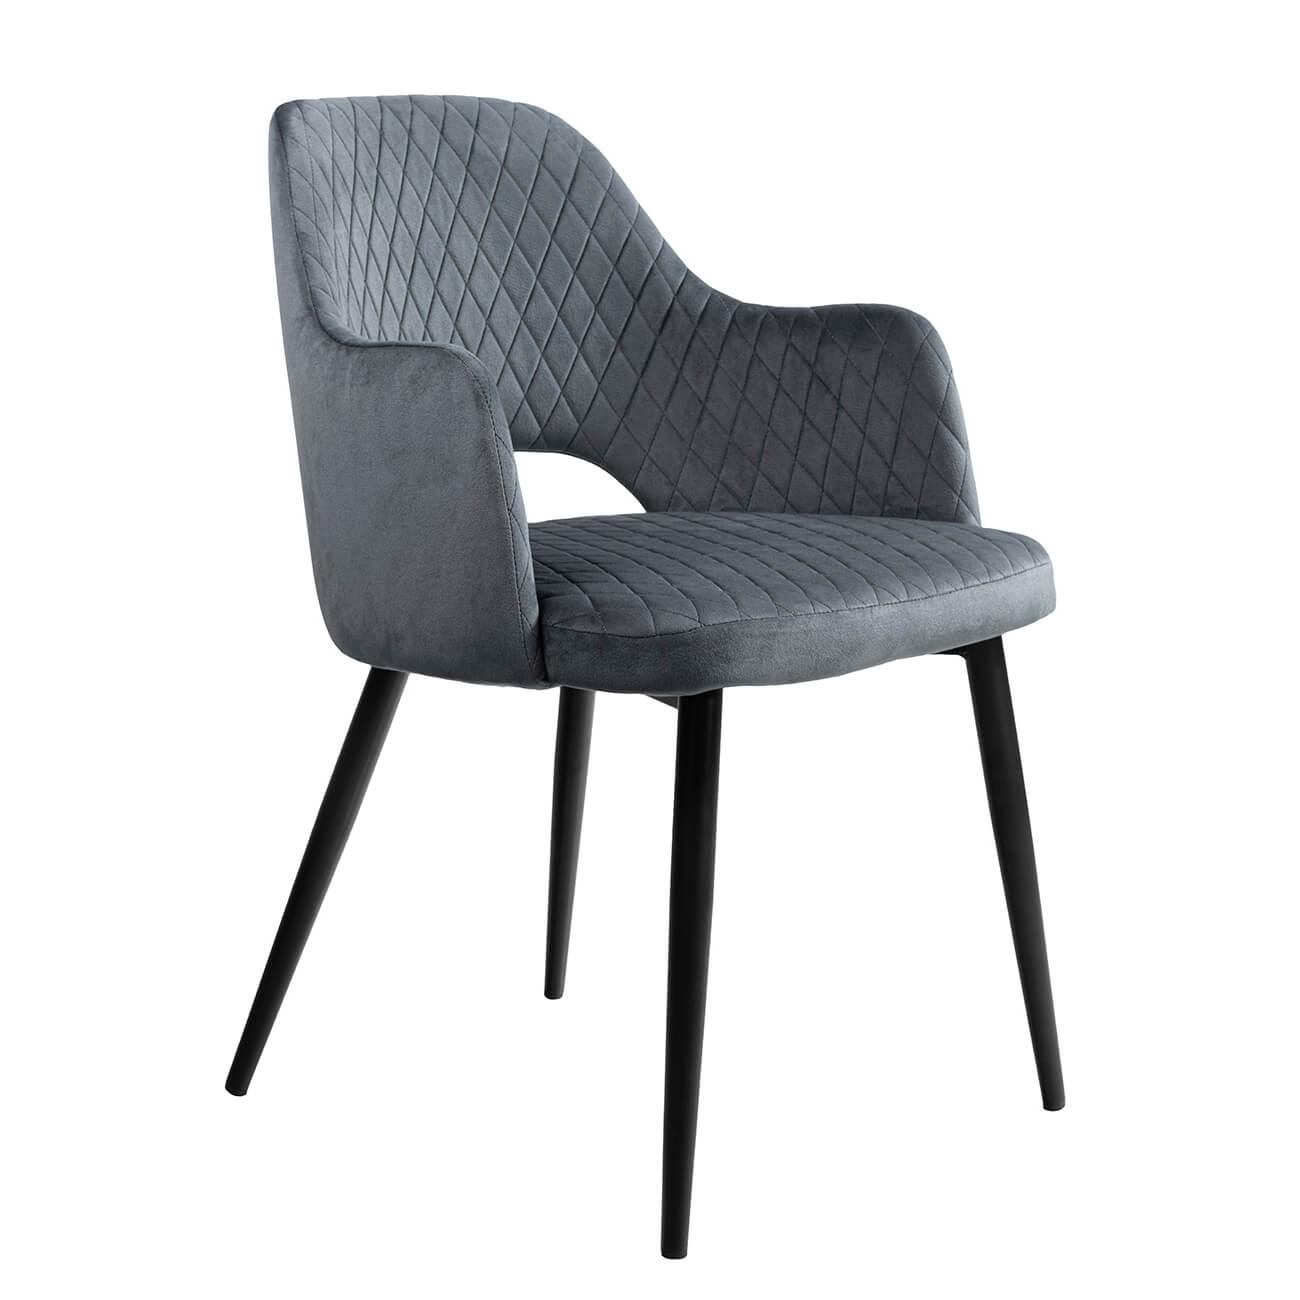 Трапезен стол Daisy, тъмно сив